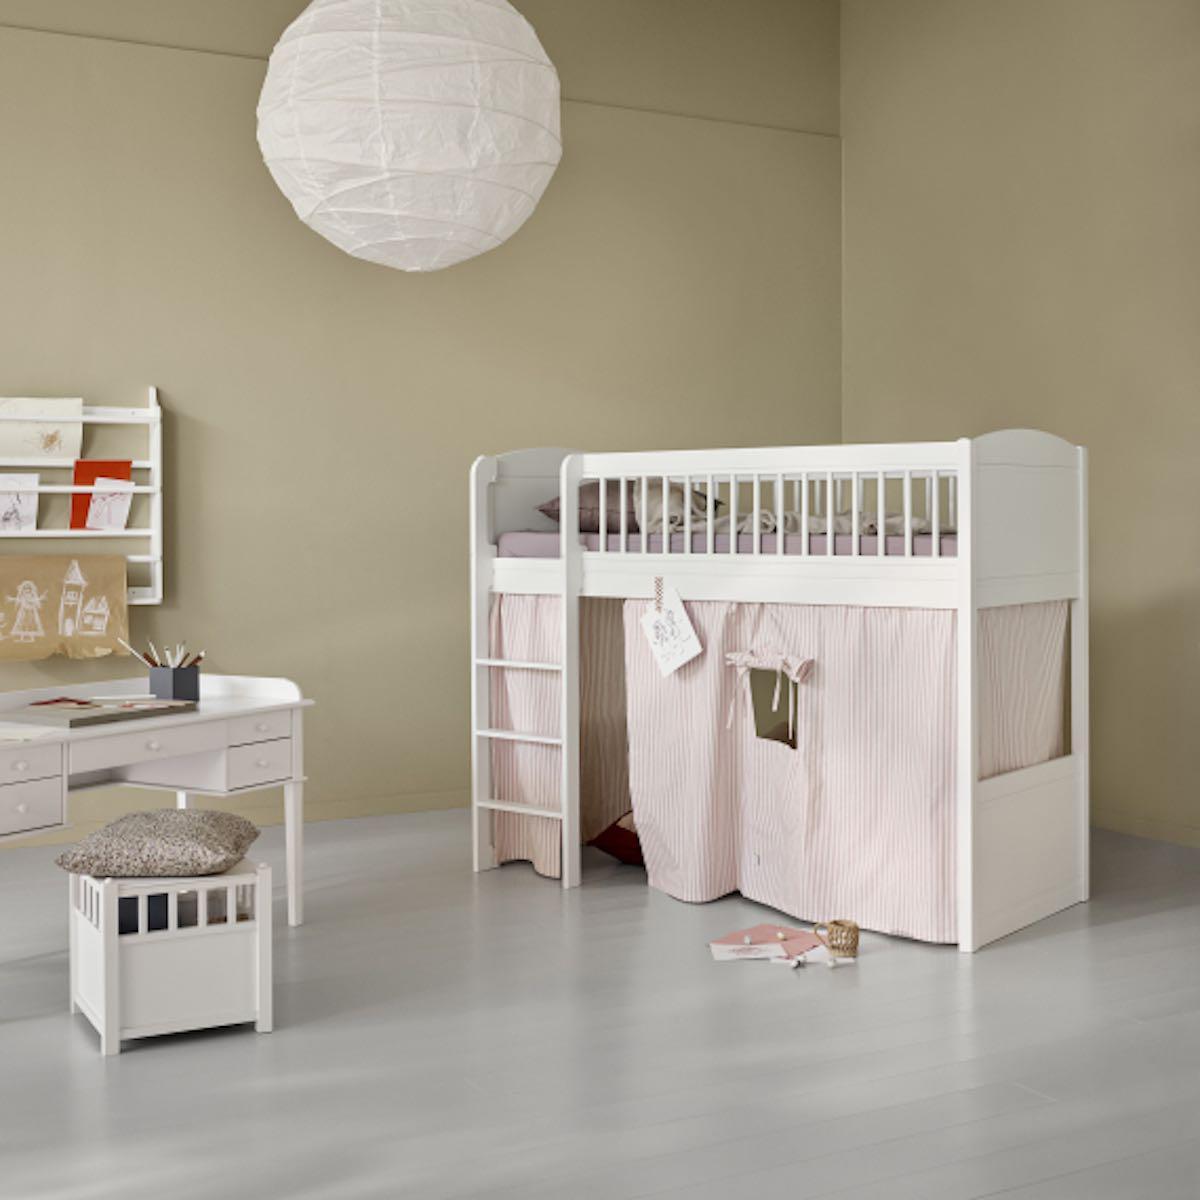 Cortina cama media-alta SEASIDE LILLE+ Oliver Furniture gris